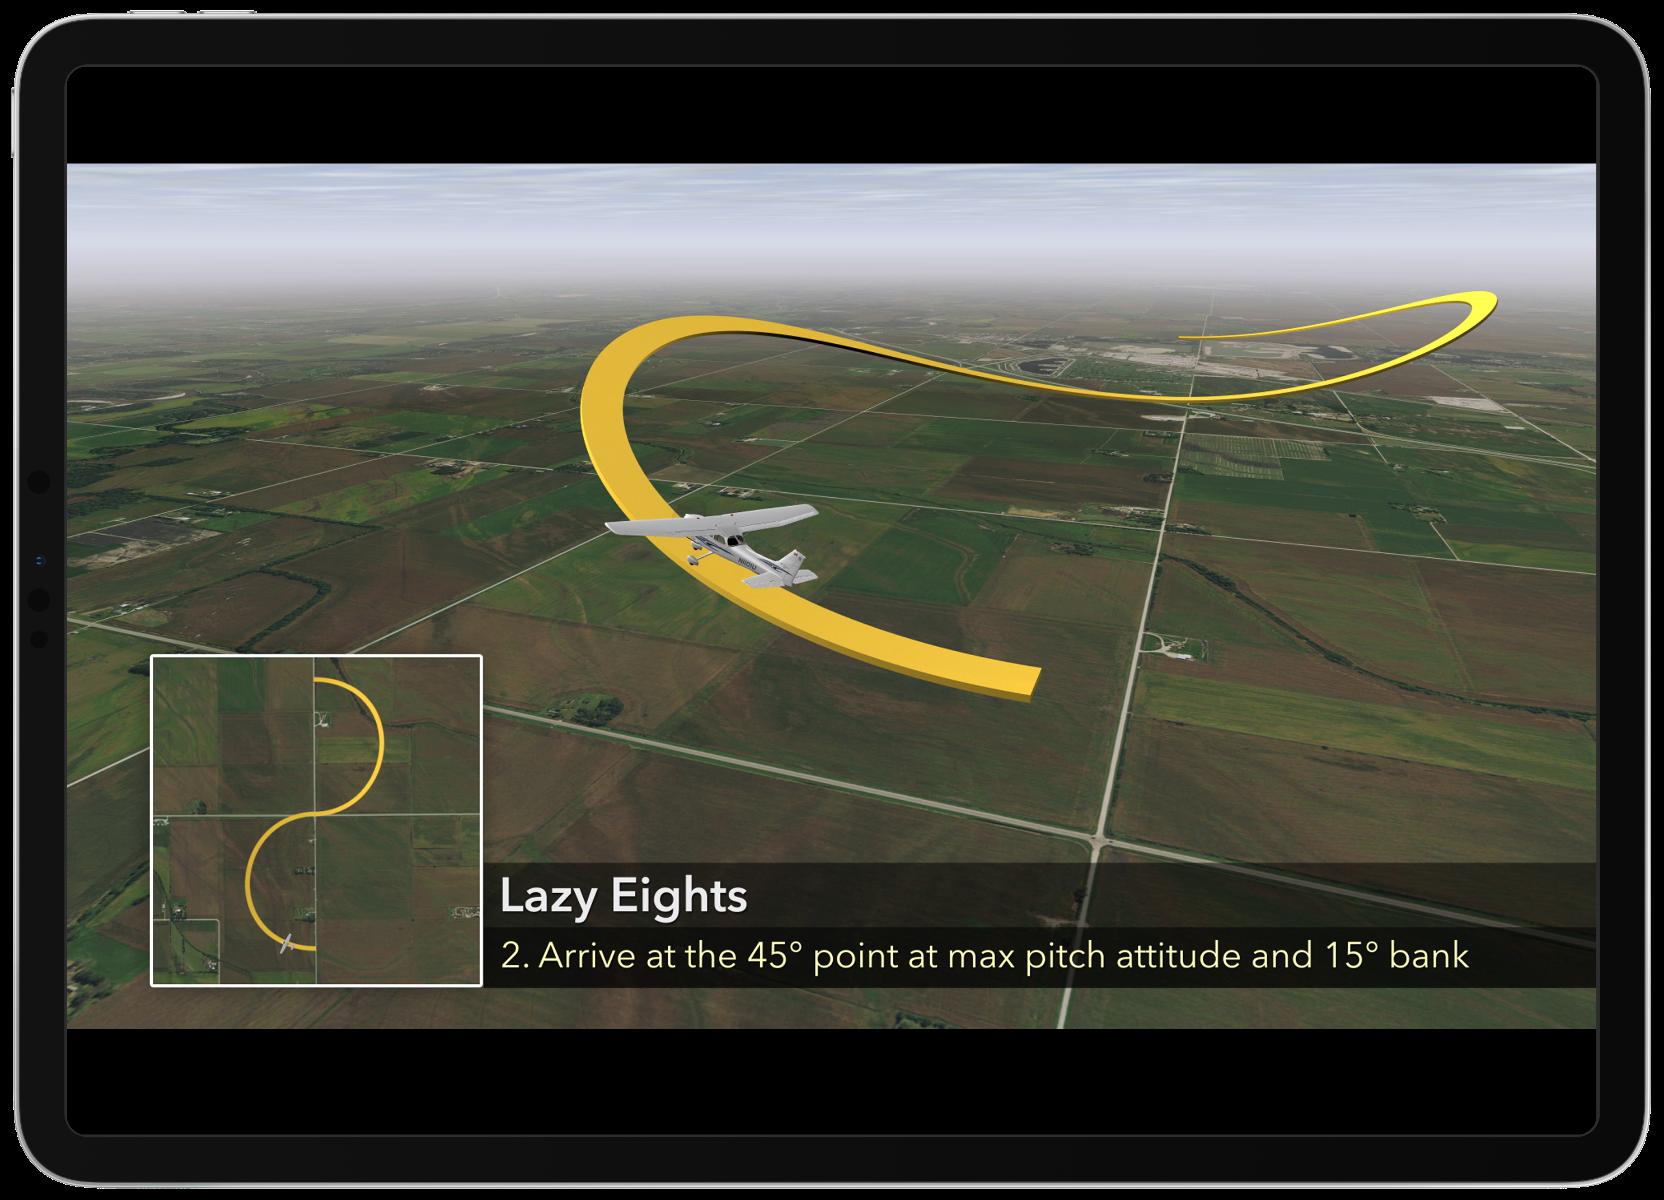 comm_iPad_maneuvers_2